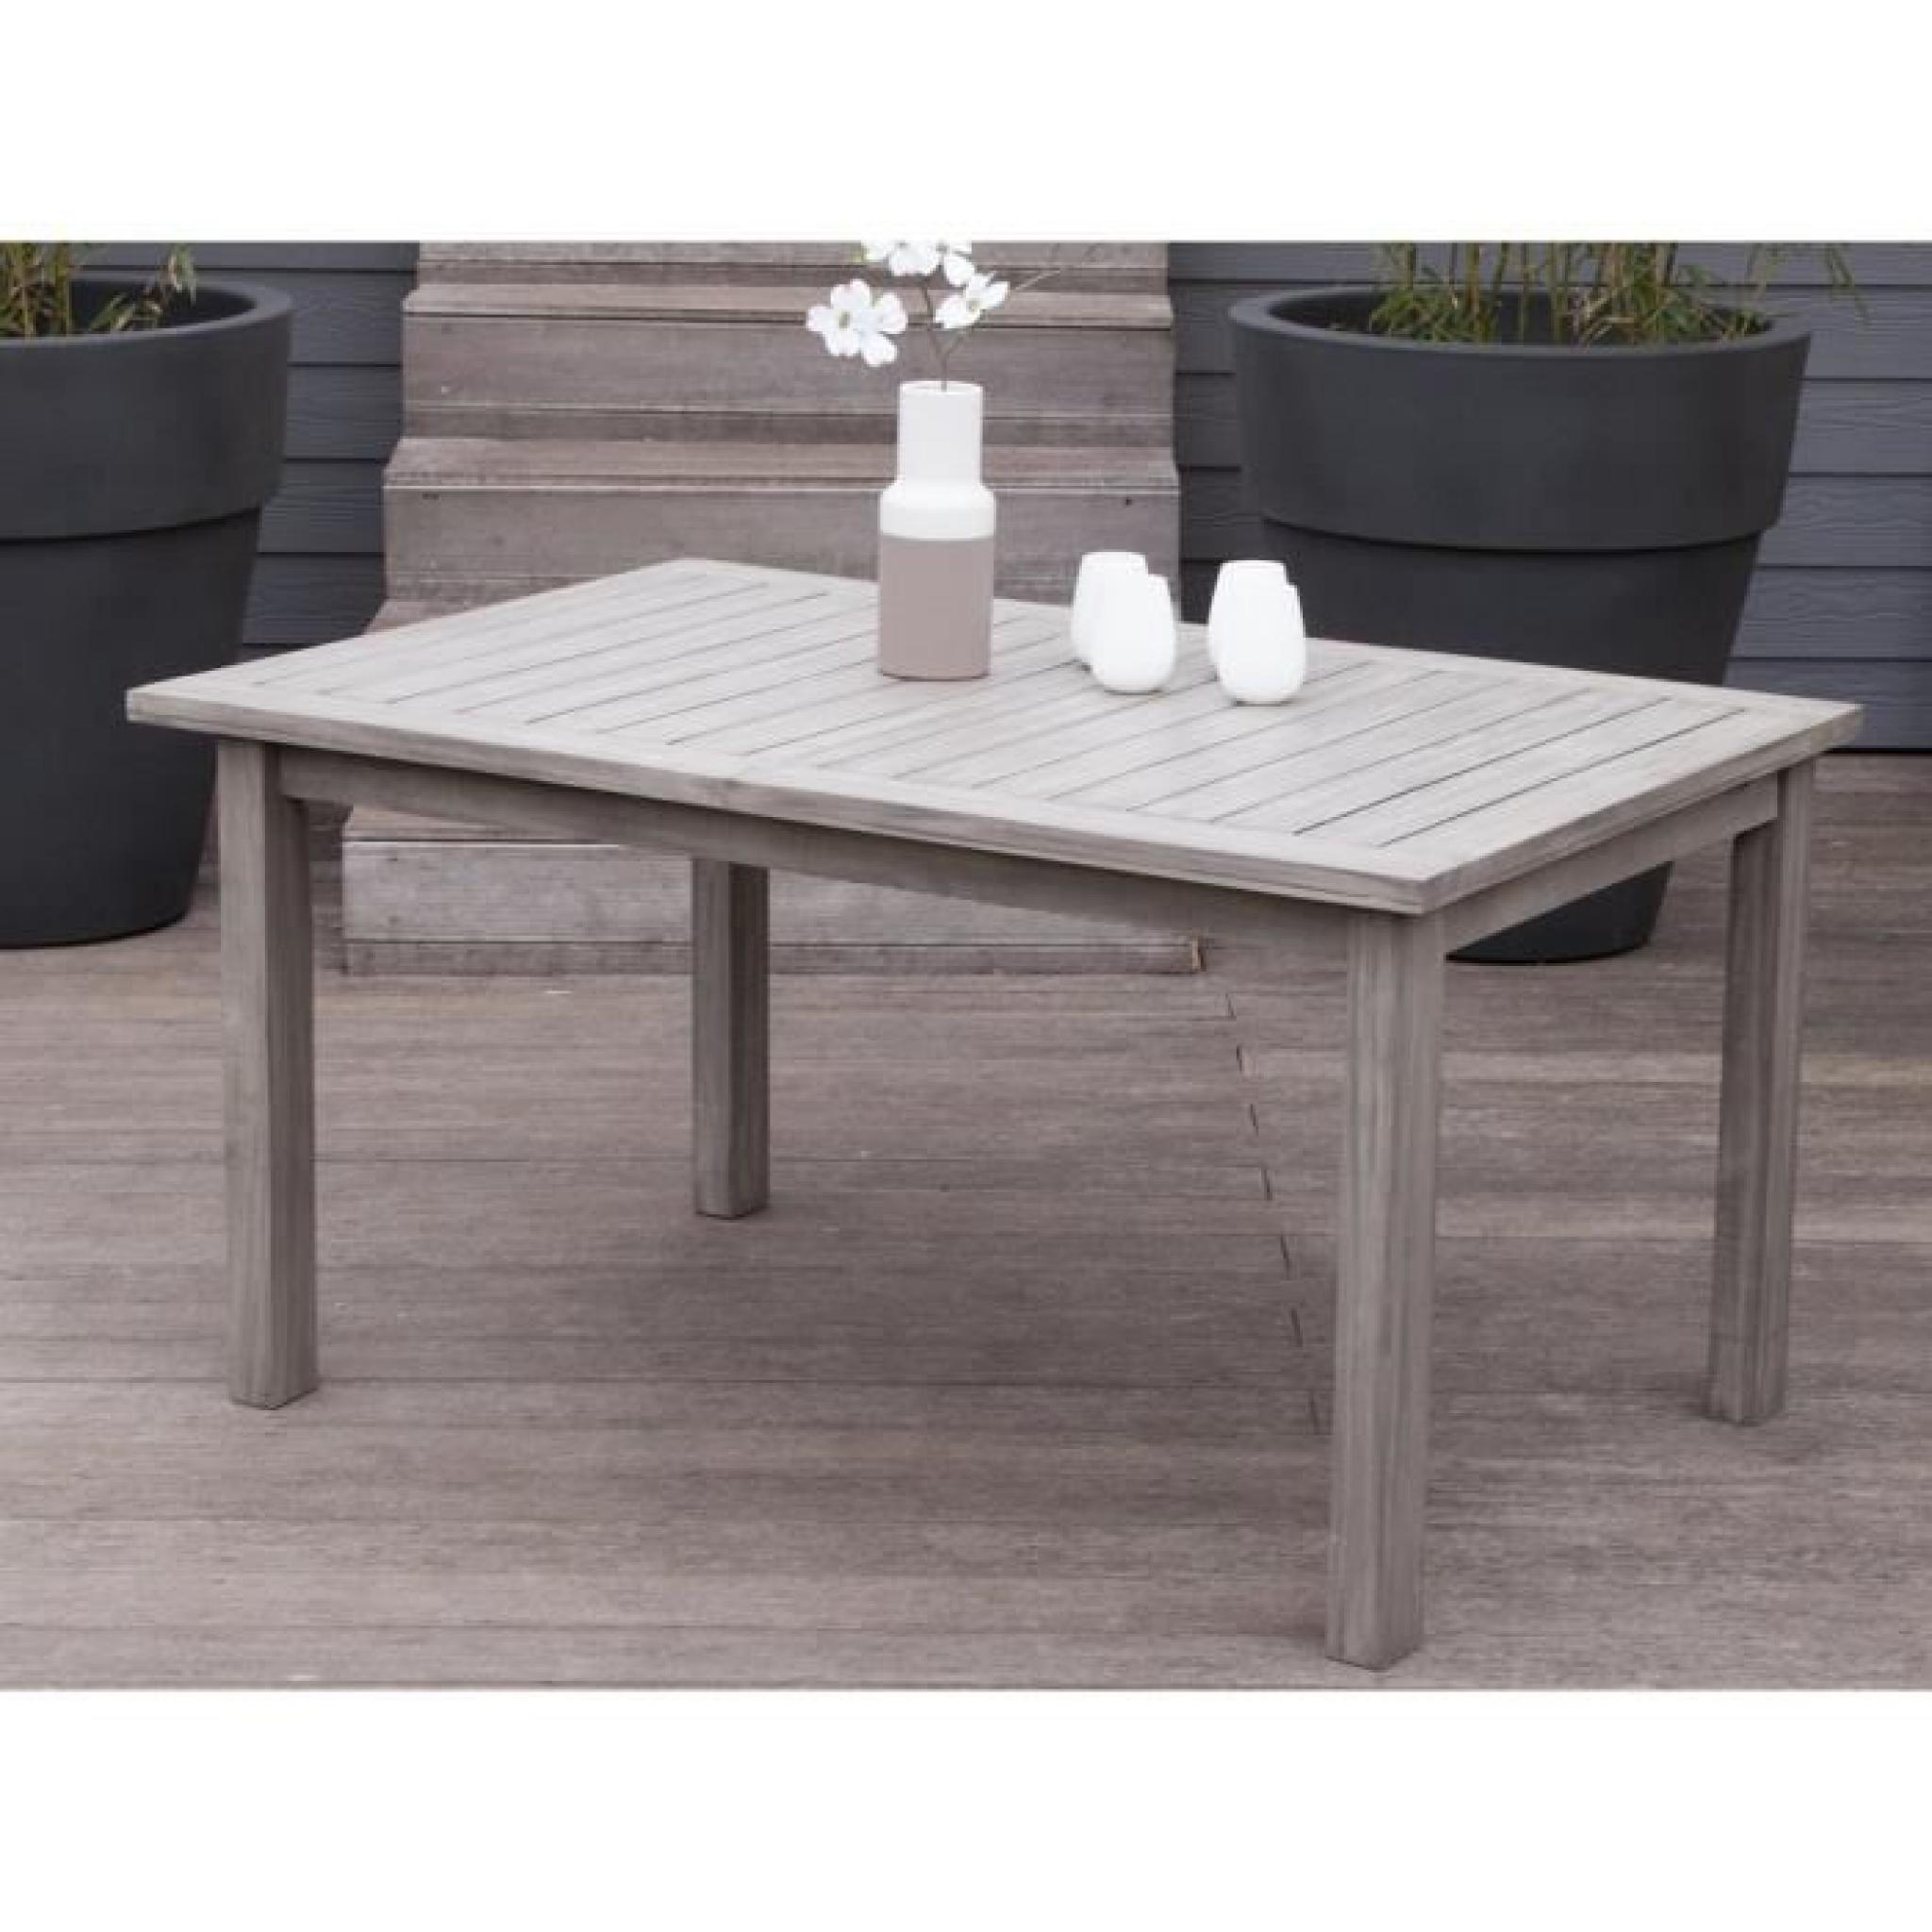 Table De Jardin Extensible En Acacia 150-200X100Cm Silverwood à Table De Jardin Extensible Pas Cher